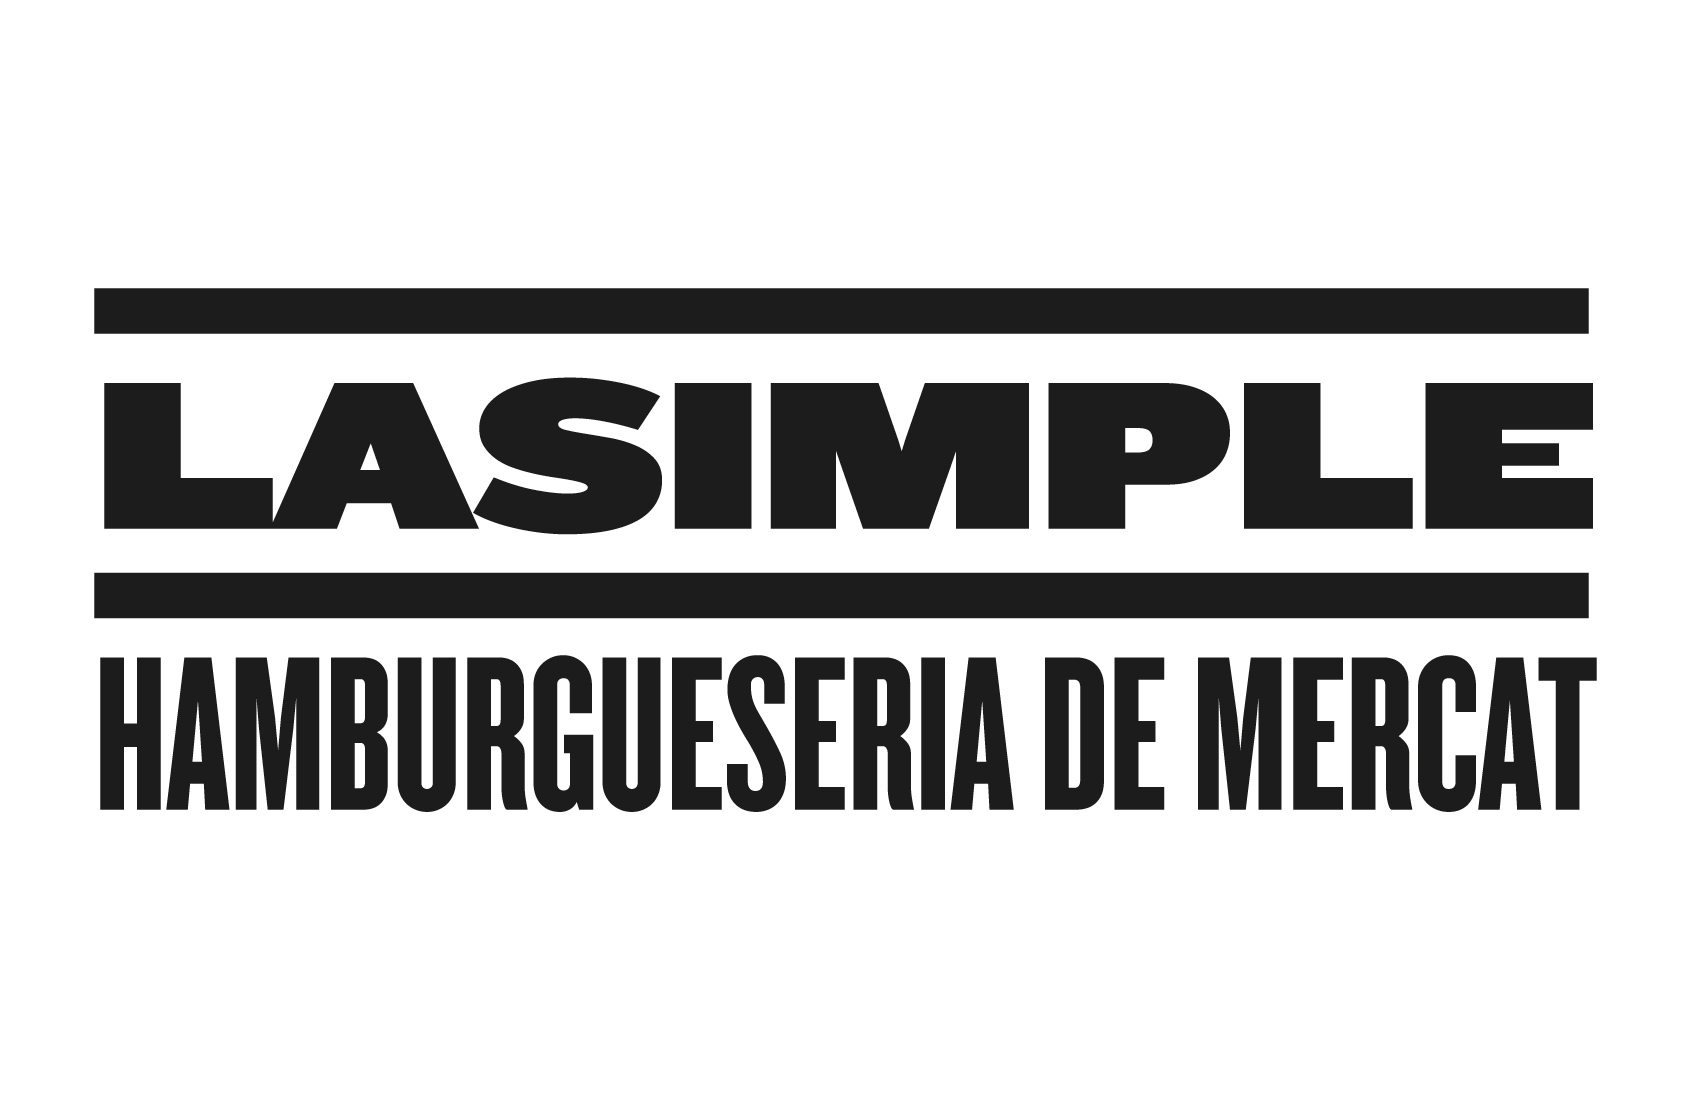 lasimple-hamburgueseria-logo